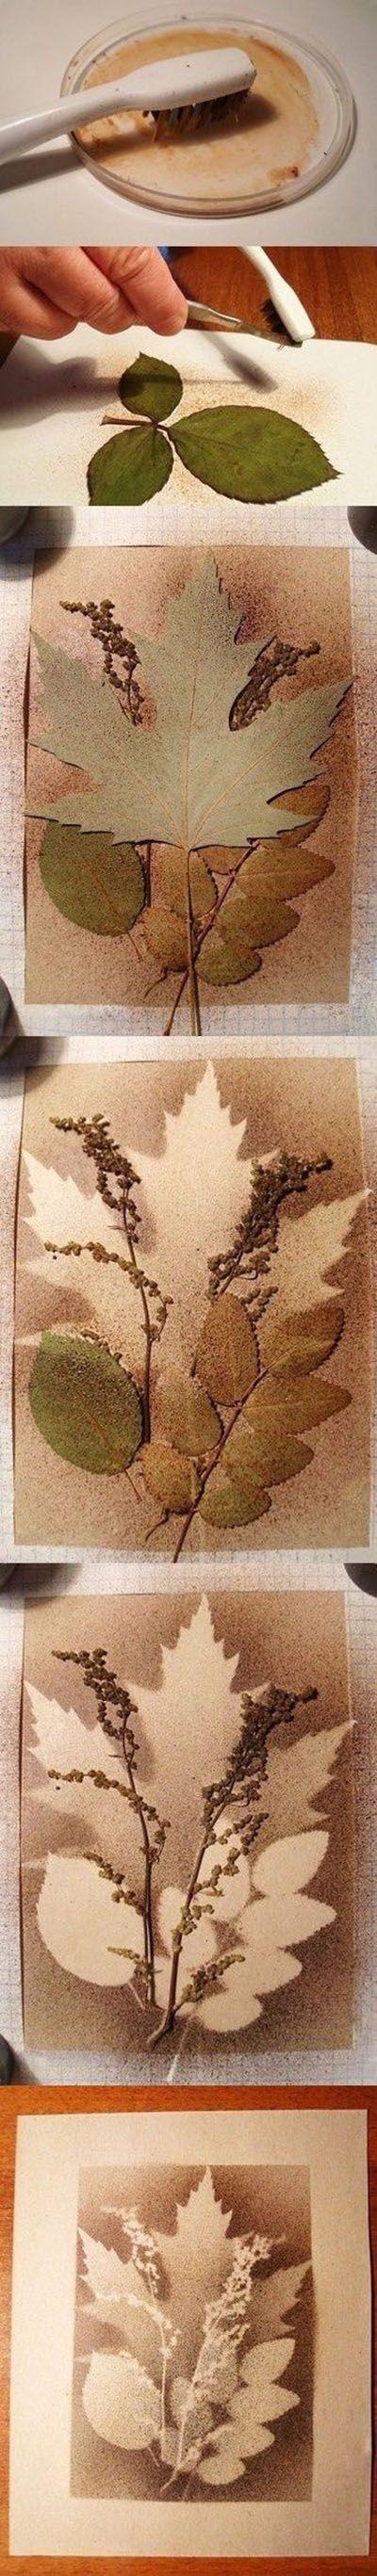 Great Leaf DIY | DIY & Crafts Tutorials